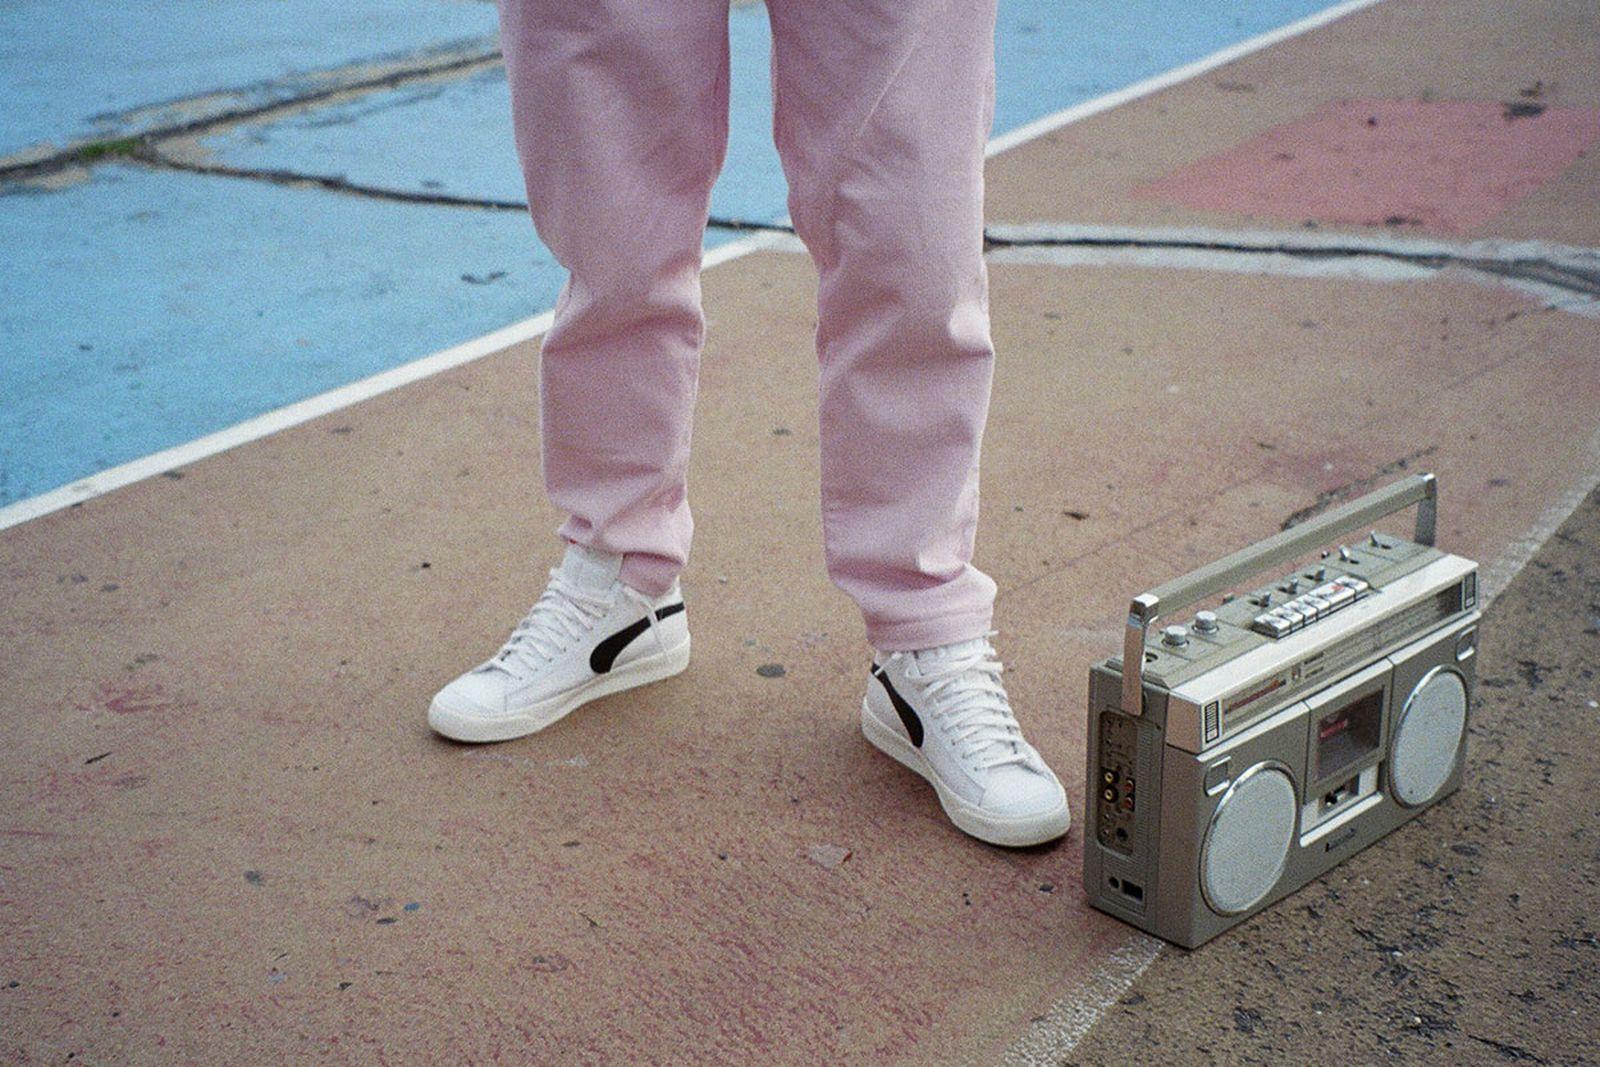 best nike sneakers slam jam blazer 01 Girls Don't Cry Martine Rose comme des garcons